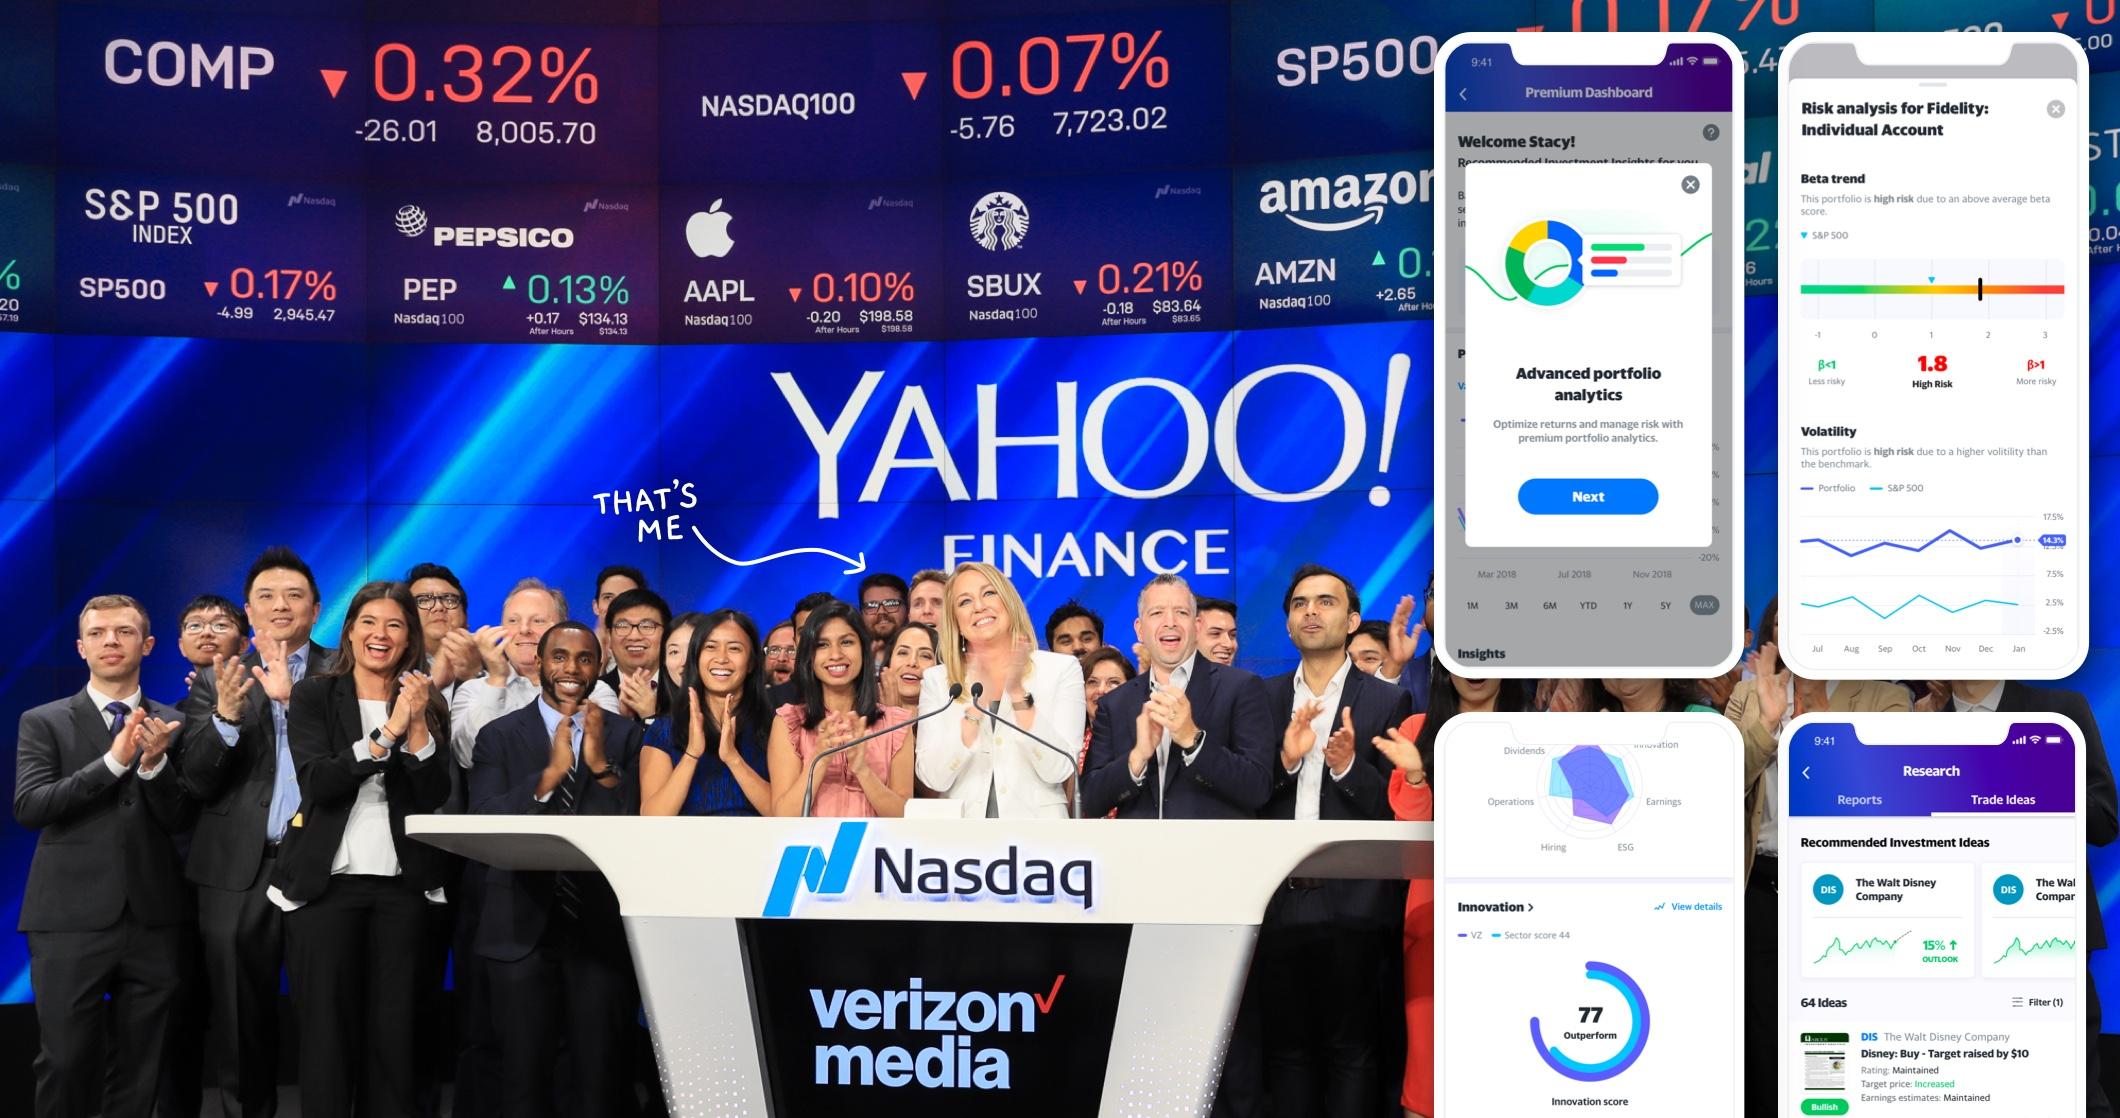 Yahoo! Finance Premium